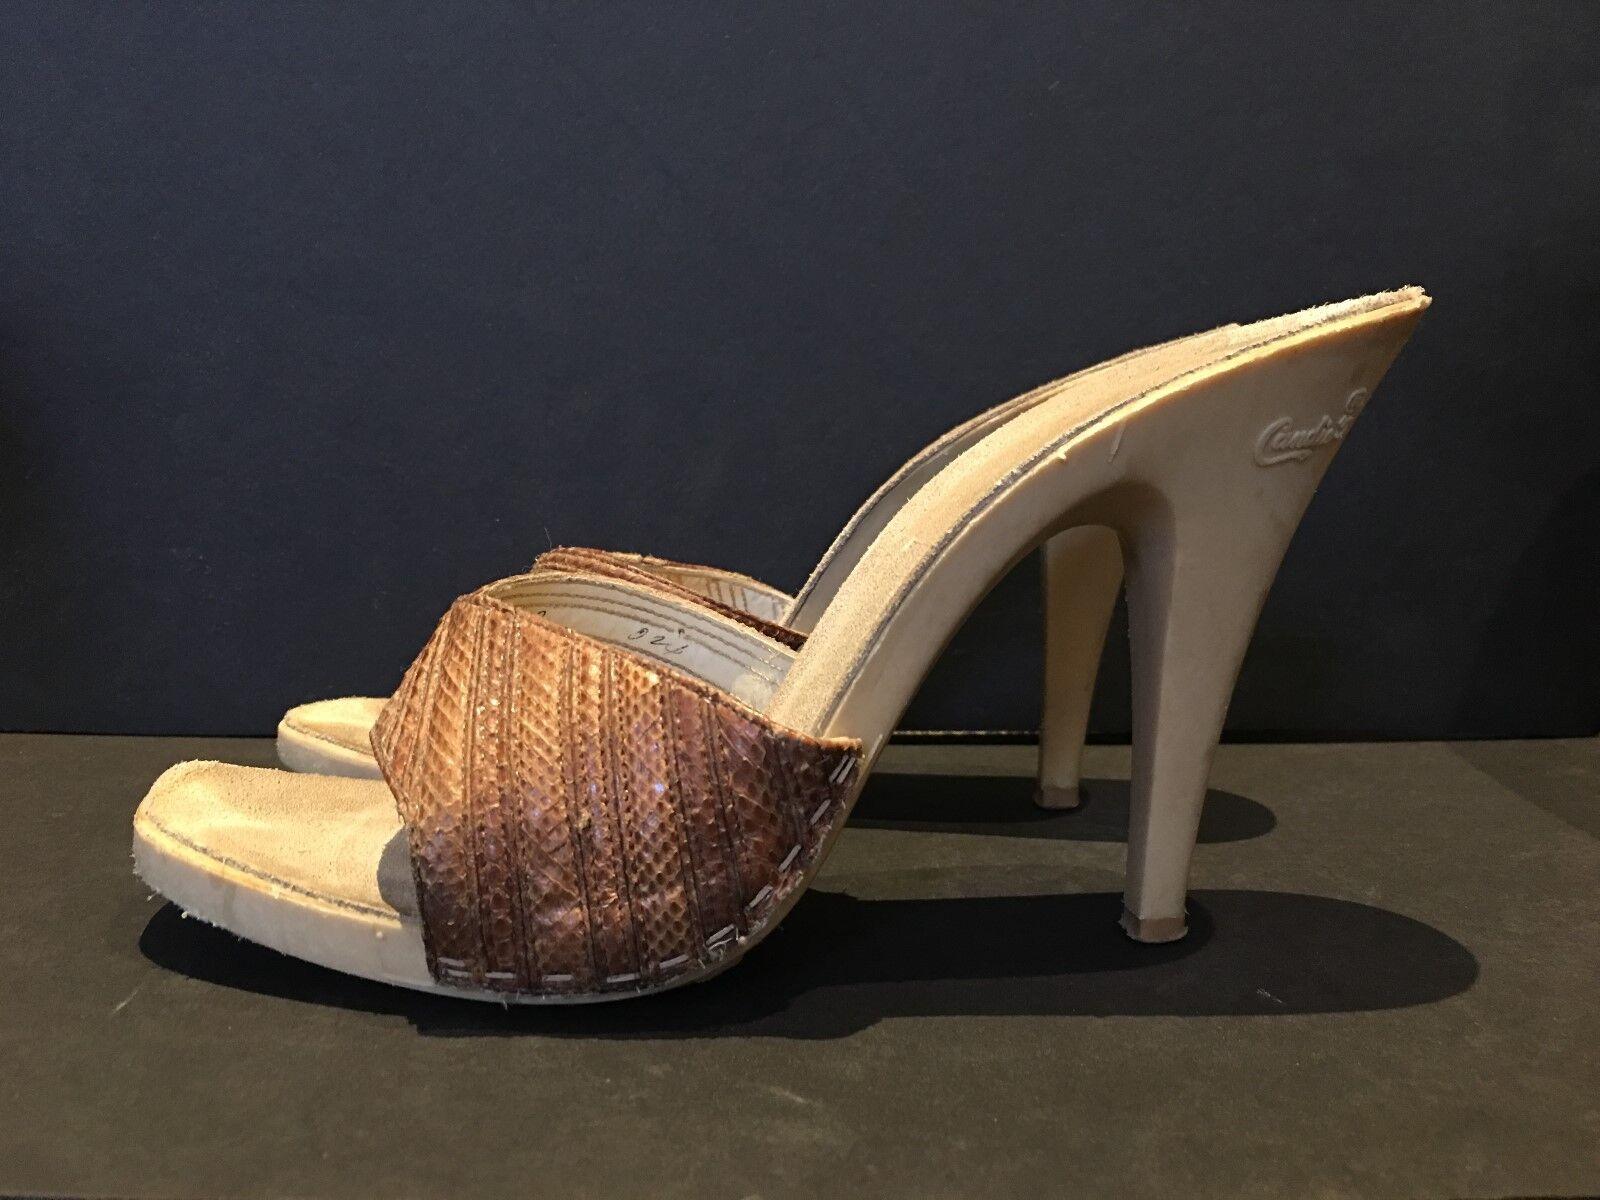 prezzo all'ingrosso e qualità affidabile Candies Candies Candies Vintage Heels - Marrone - Dimensione 9  prezzo all'ingrosso